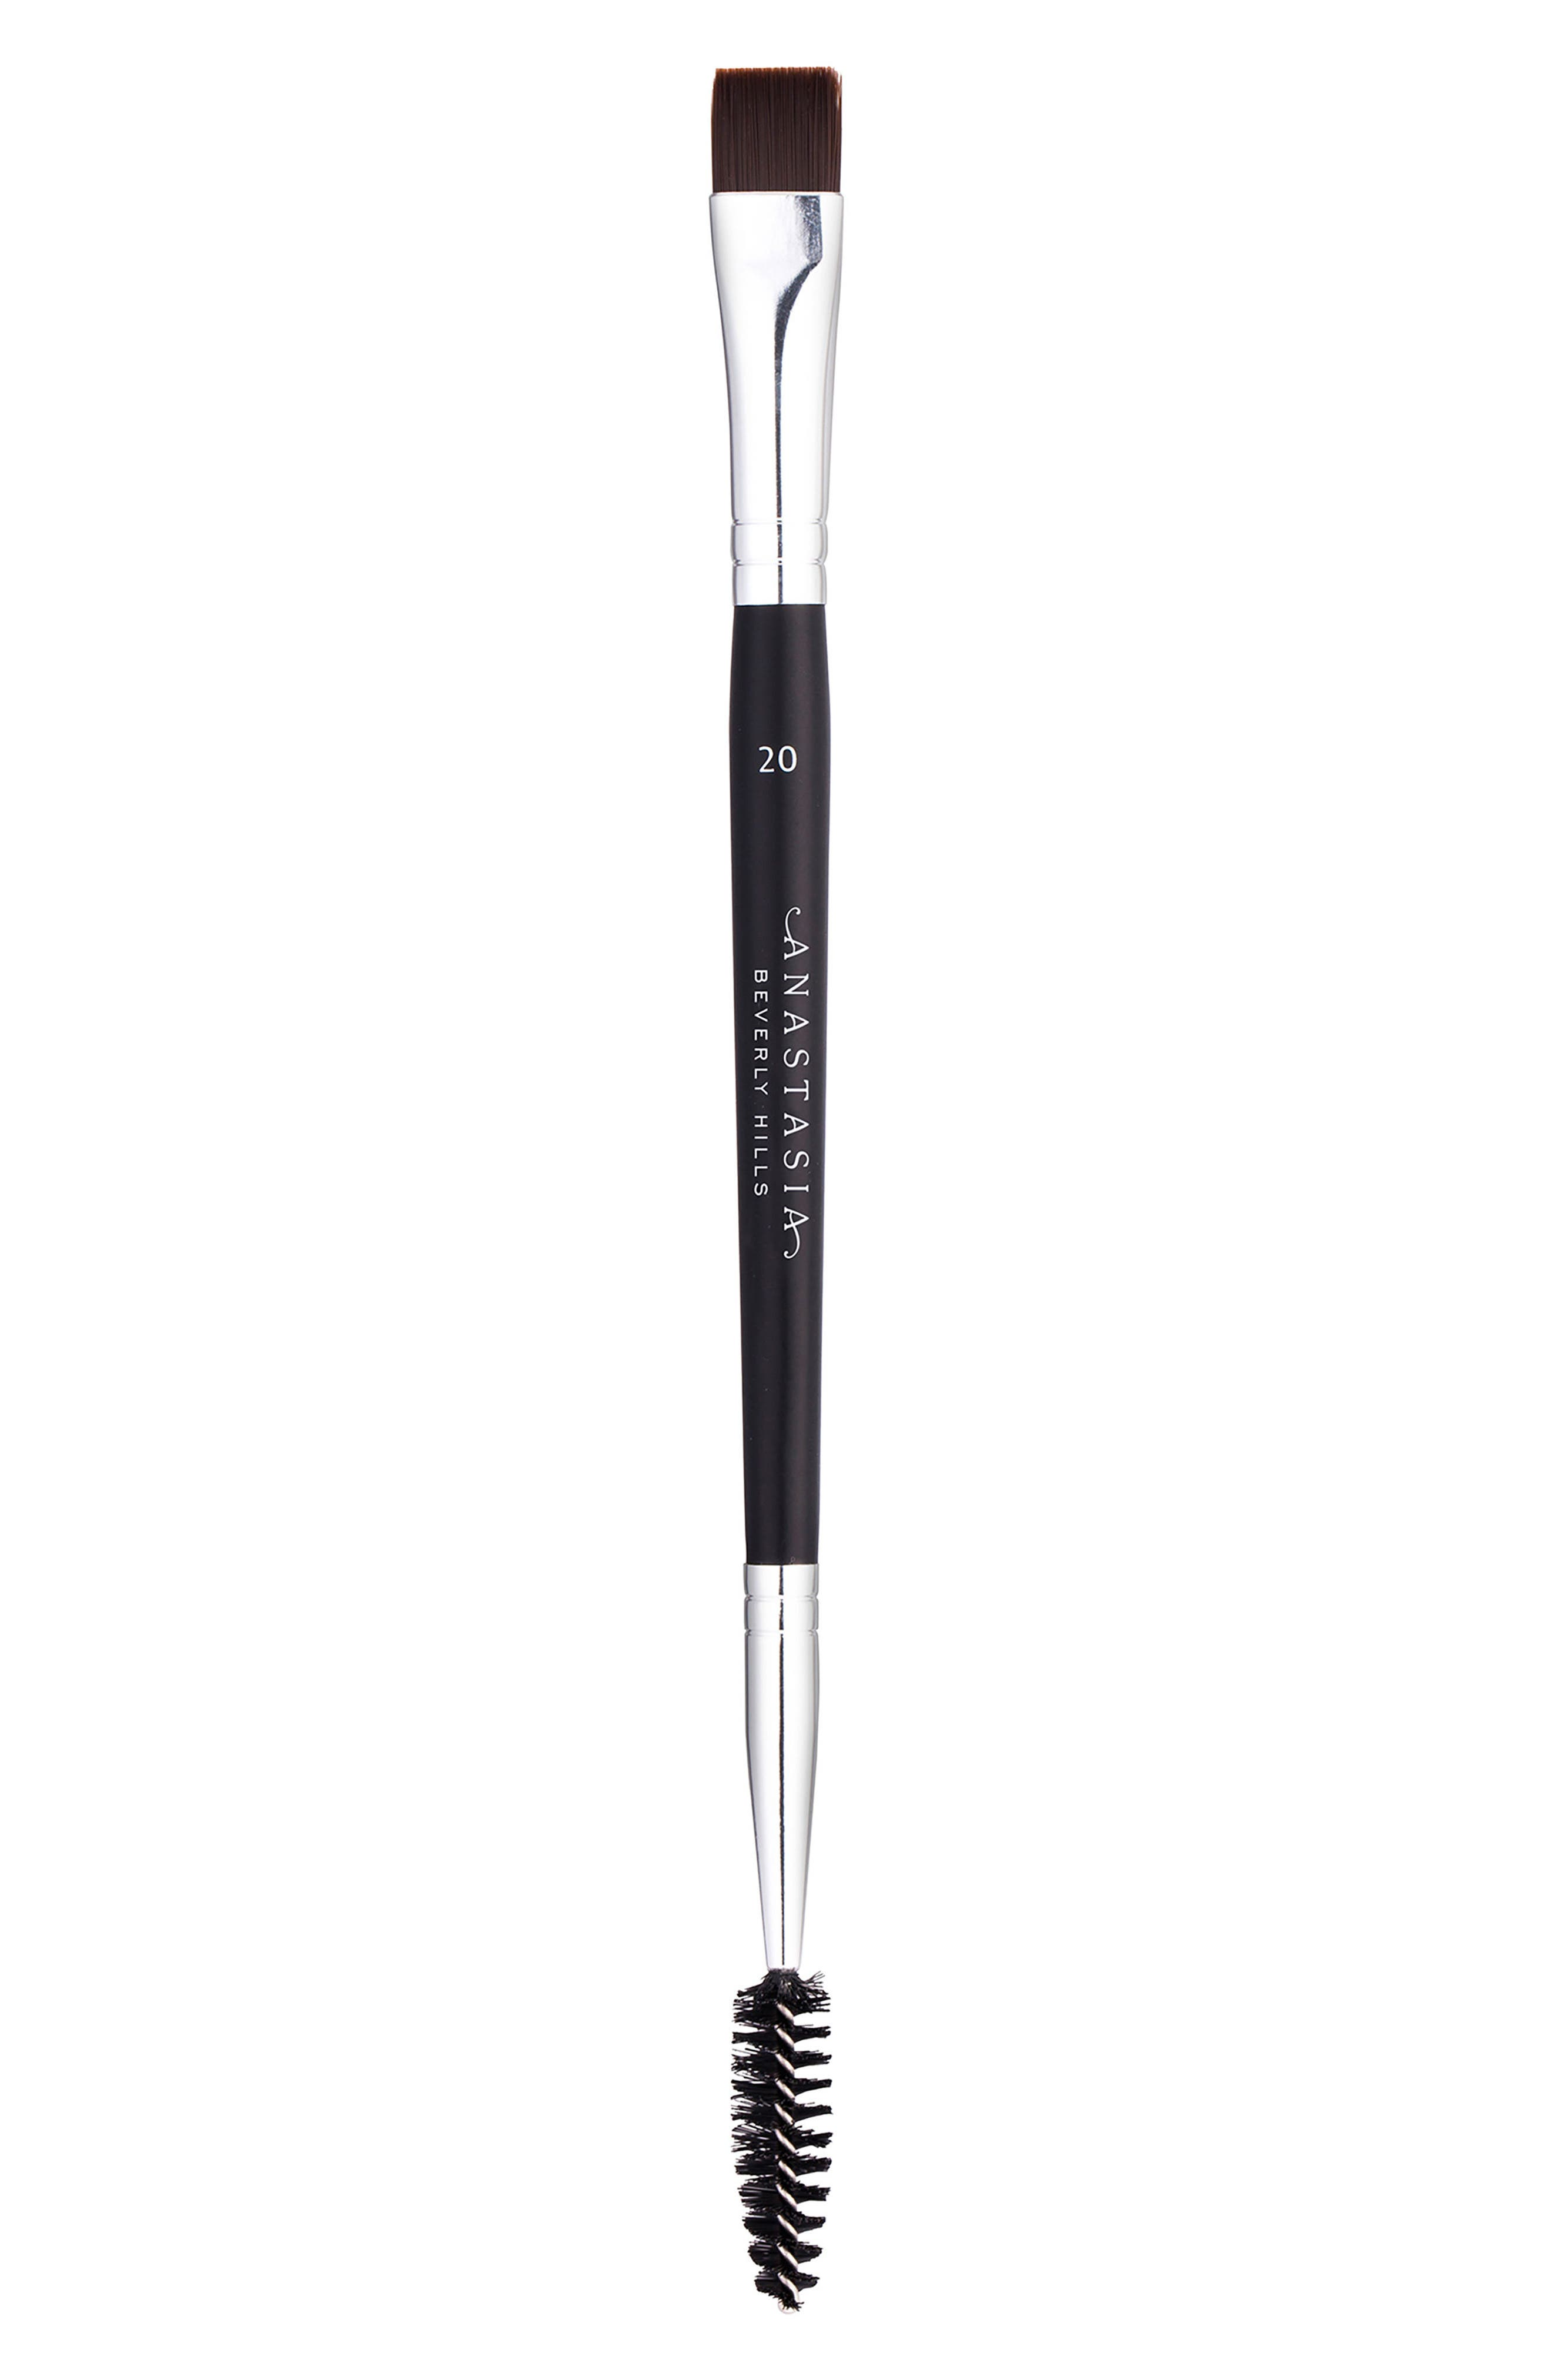 Anastasia Beverly Hills #20 Dual Ended Brow & Eyeliner Brush